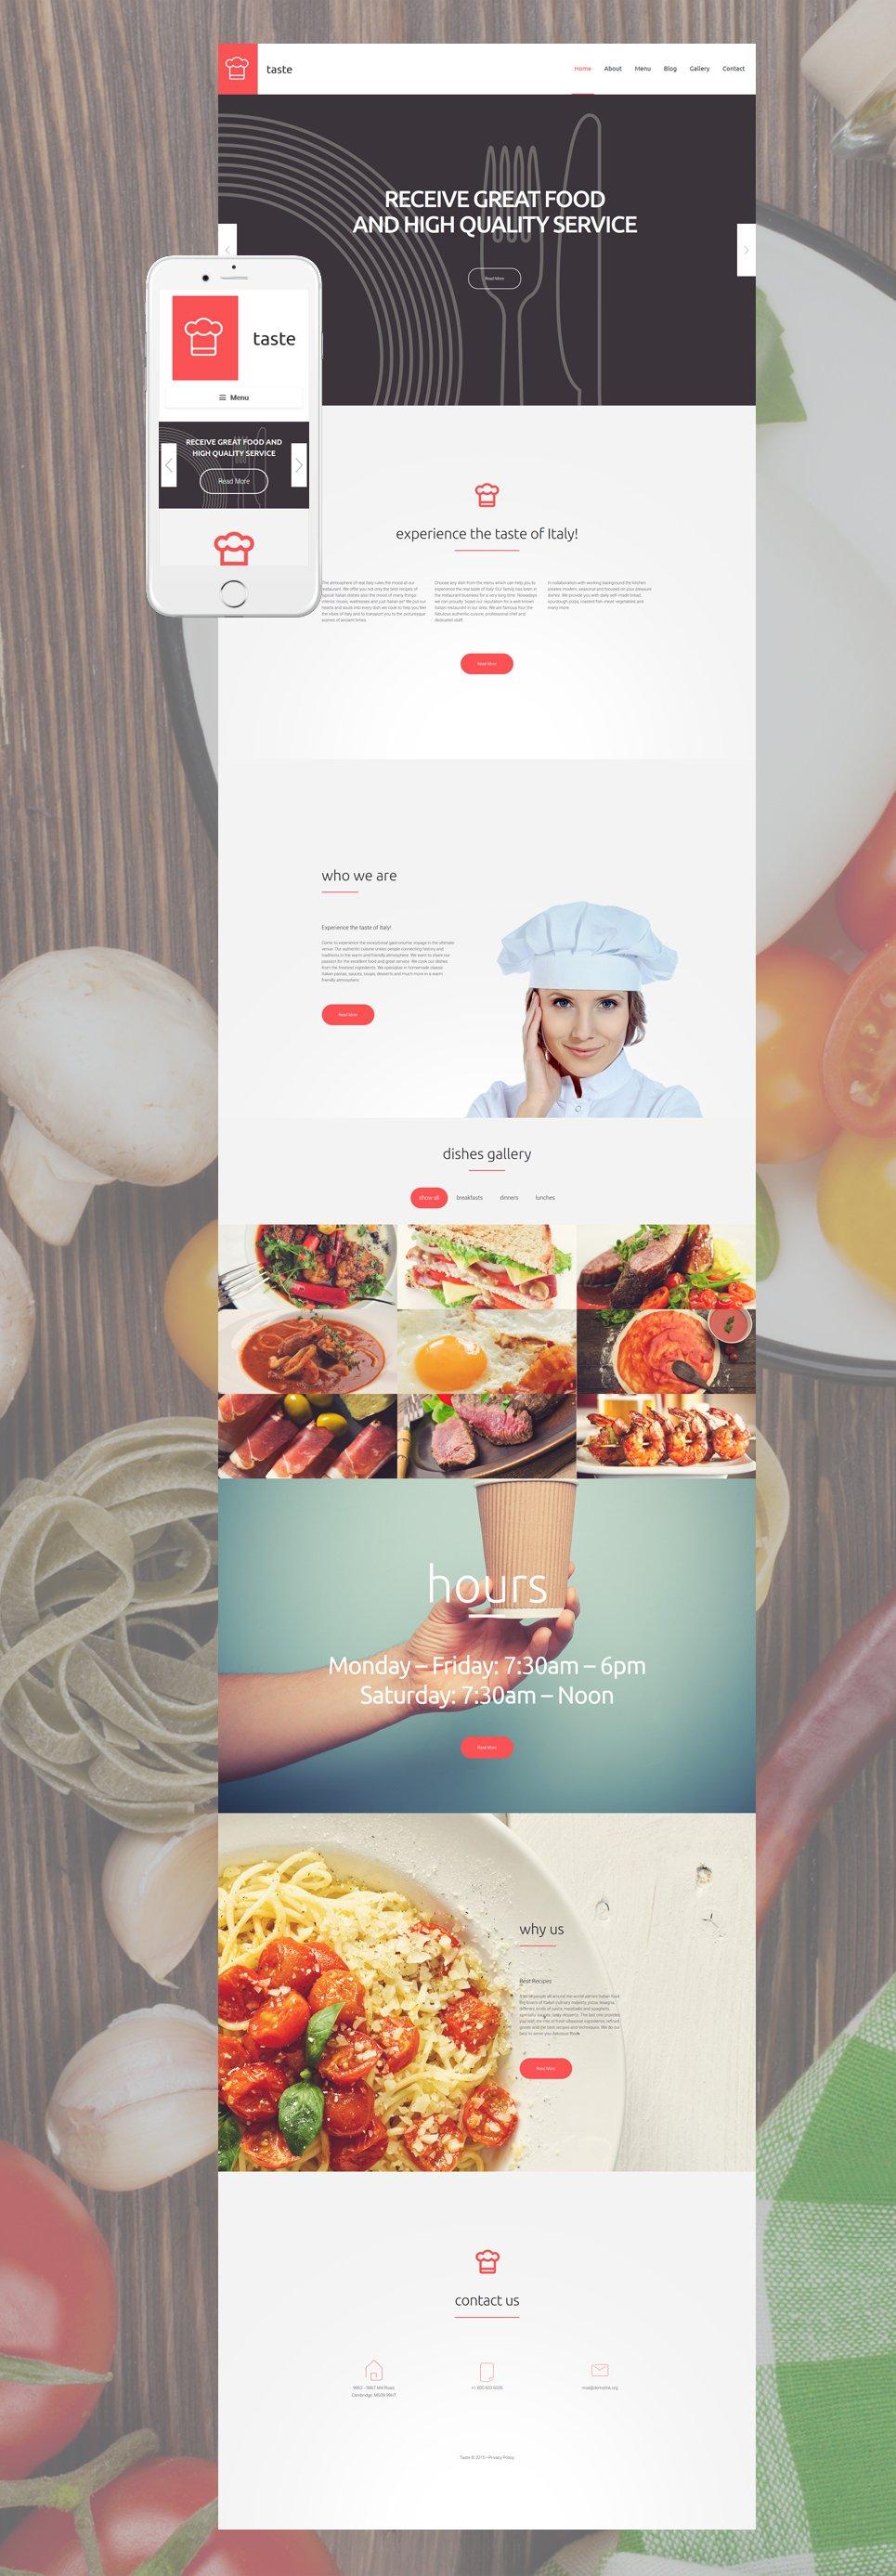 Адаптивный шаблон сайта на тему напитки и еда #55690